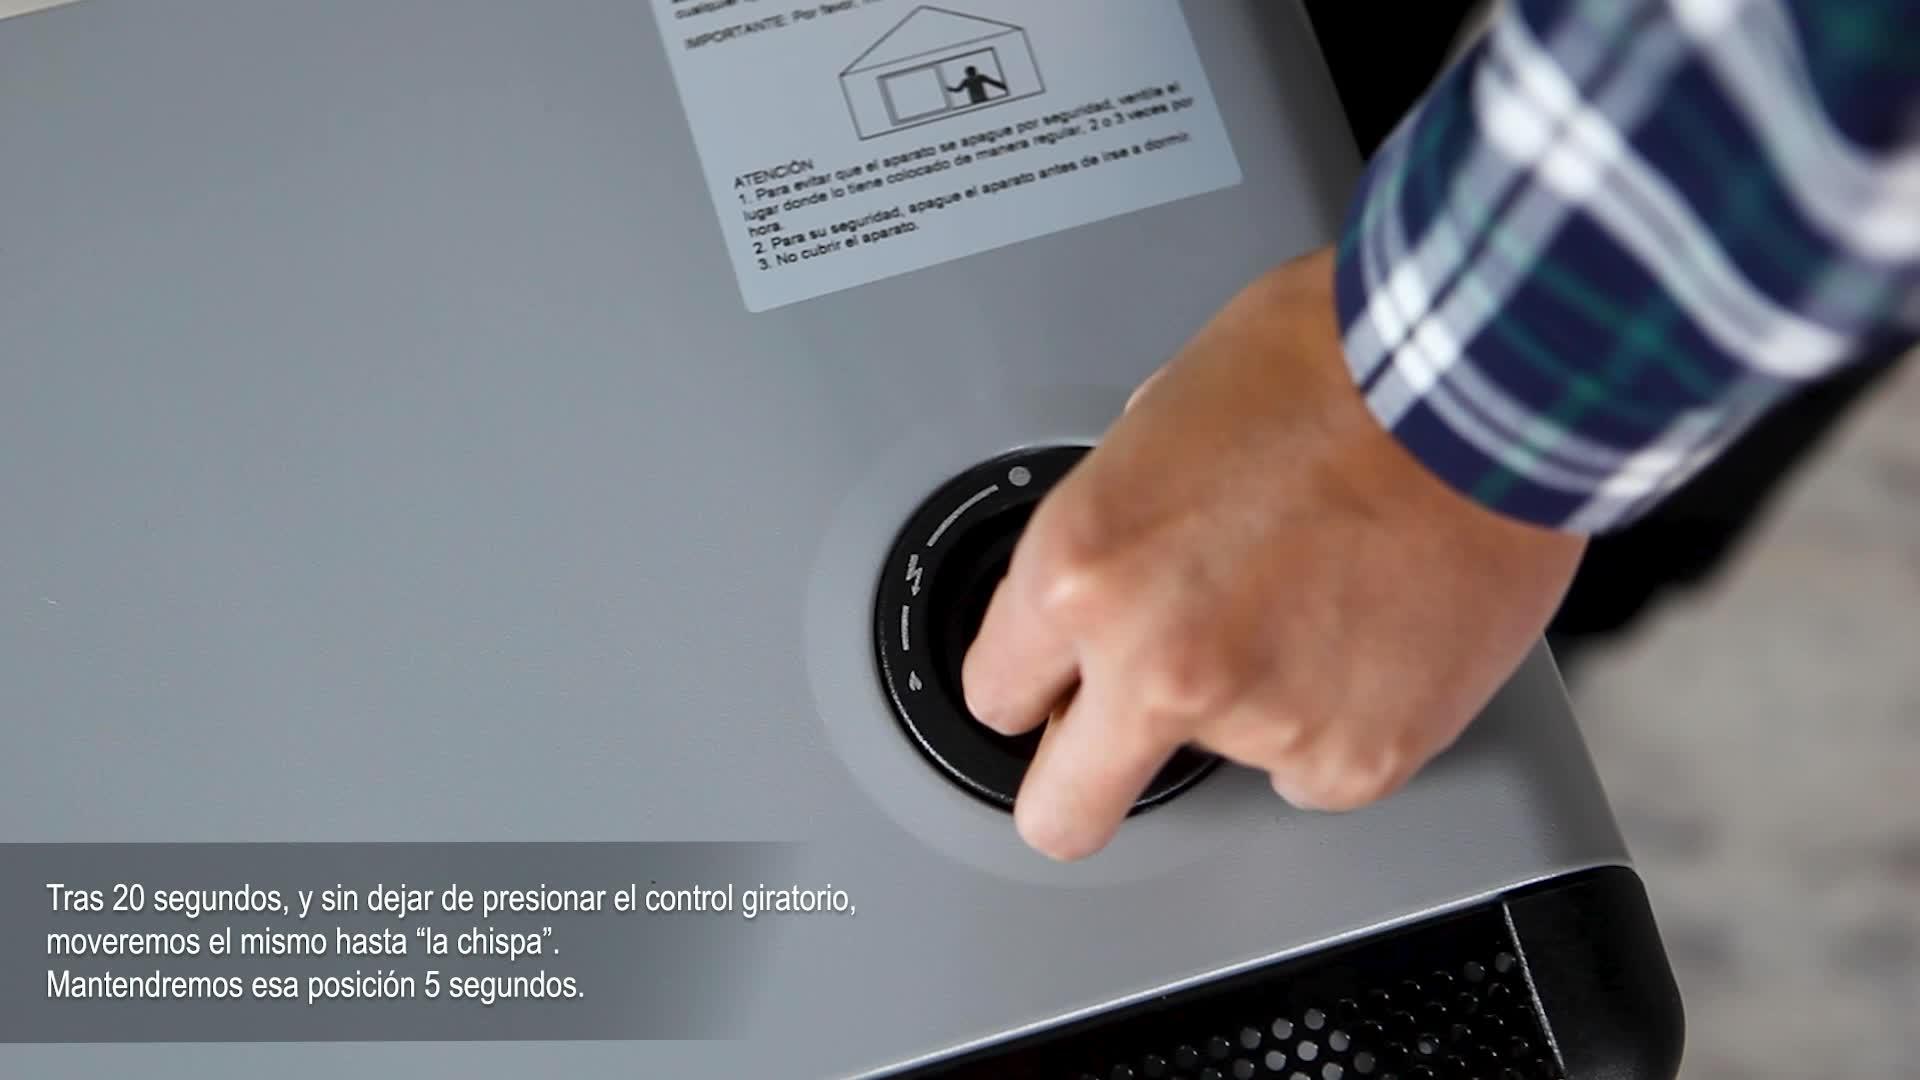 Orbegozo HBF 90 Estufa de Butano, Triple Sistema de Seguridad, Llama Azul, 4200 W, Metal, Negro/Gris